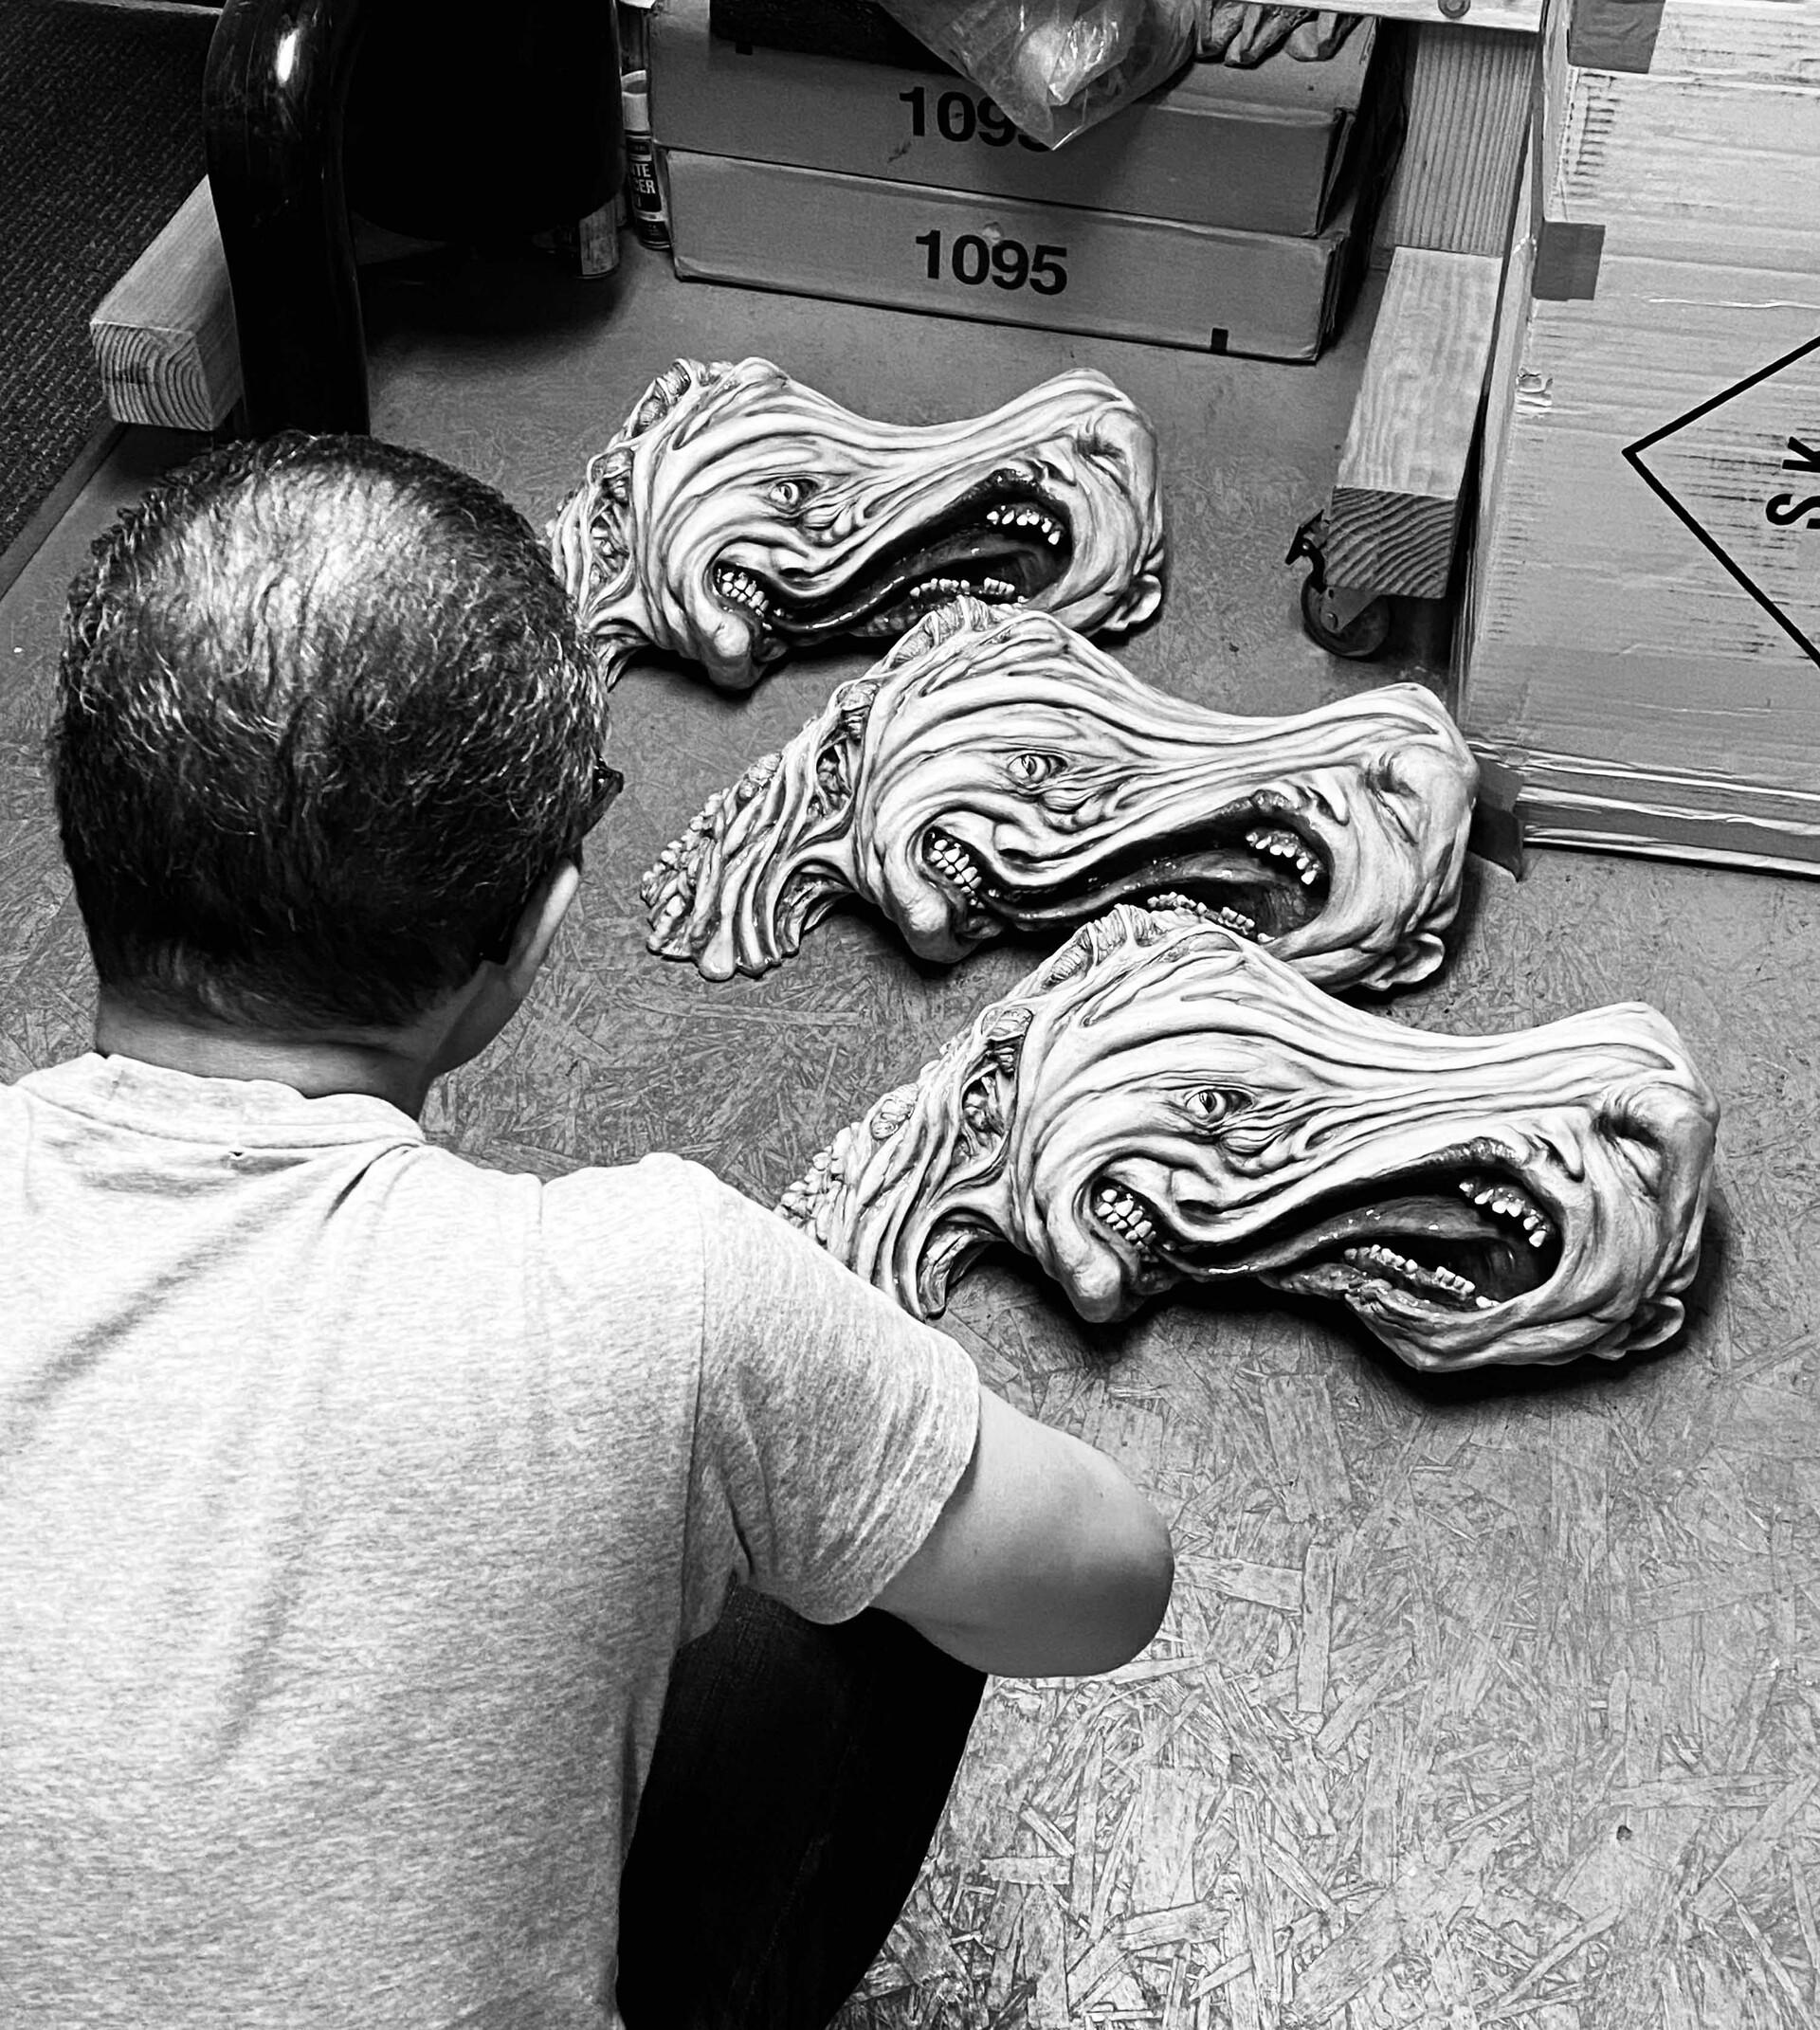 John Carpenter The Thing 1:1 Life Size Split Head W.I.P.  https://www.solidart.club/